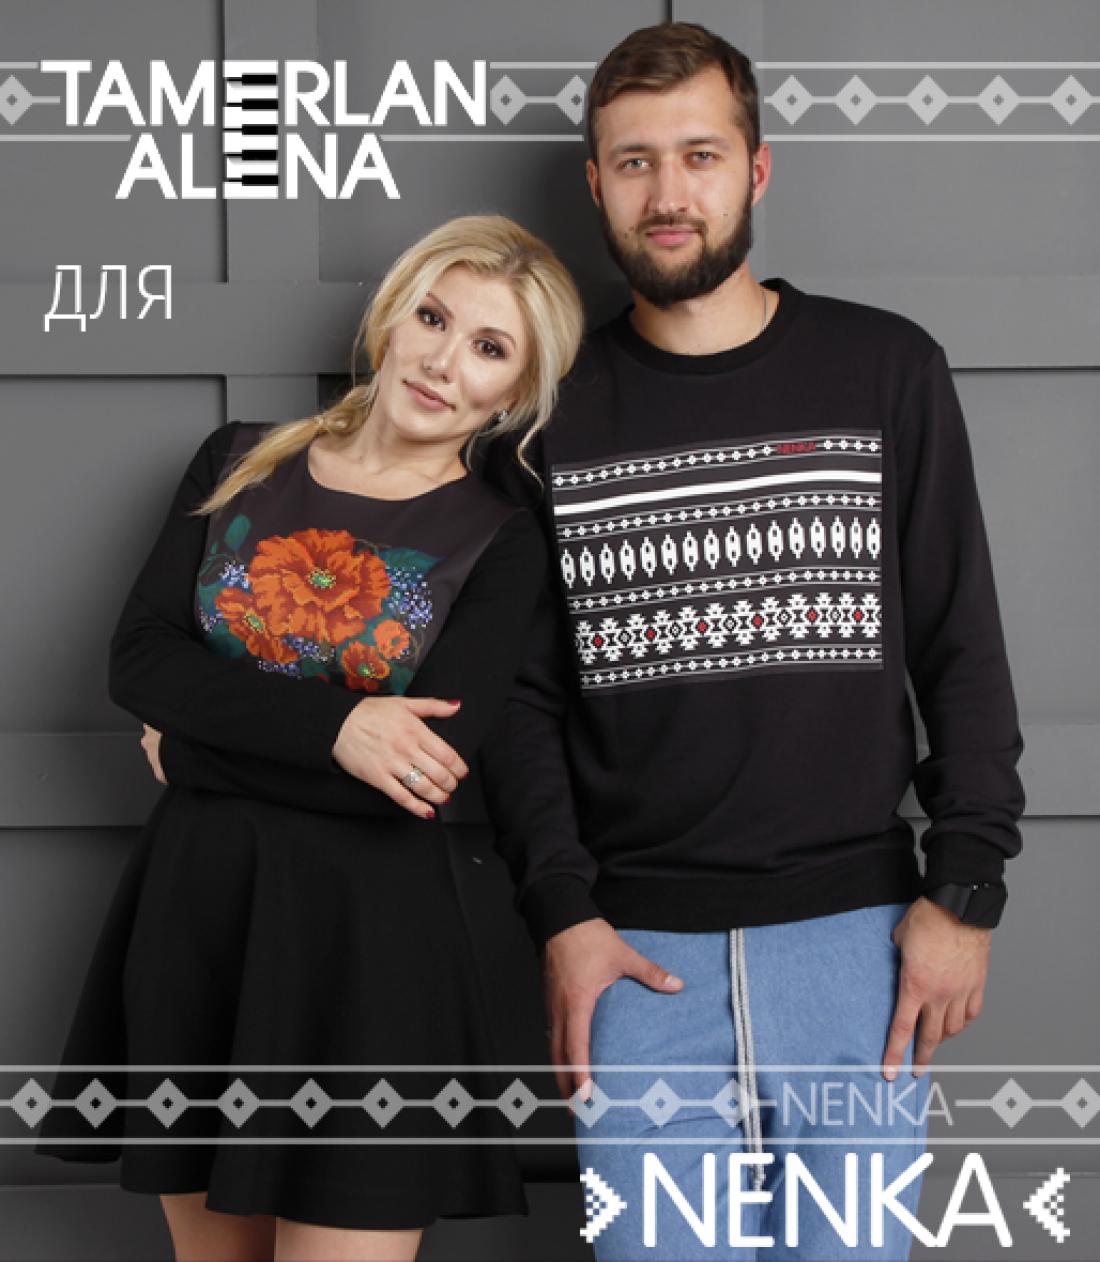 Тамерлан и Алена Омаргалиева снялись в лукбуке украинского бренда